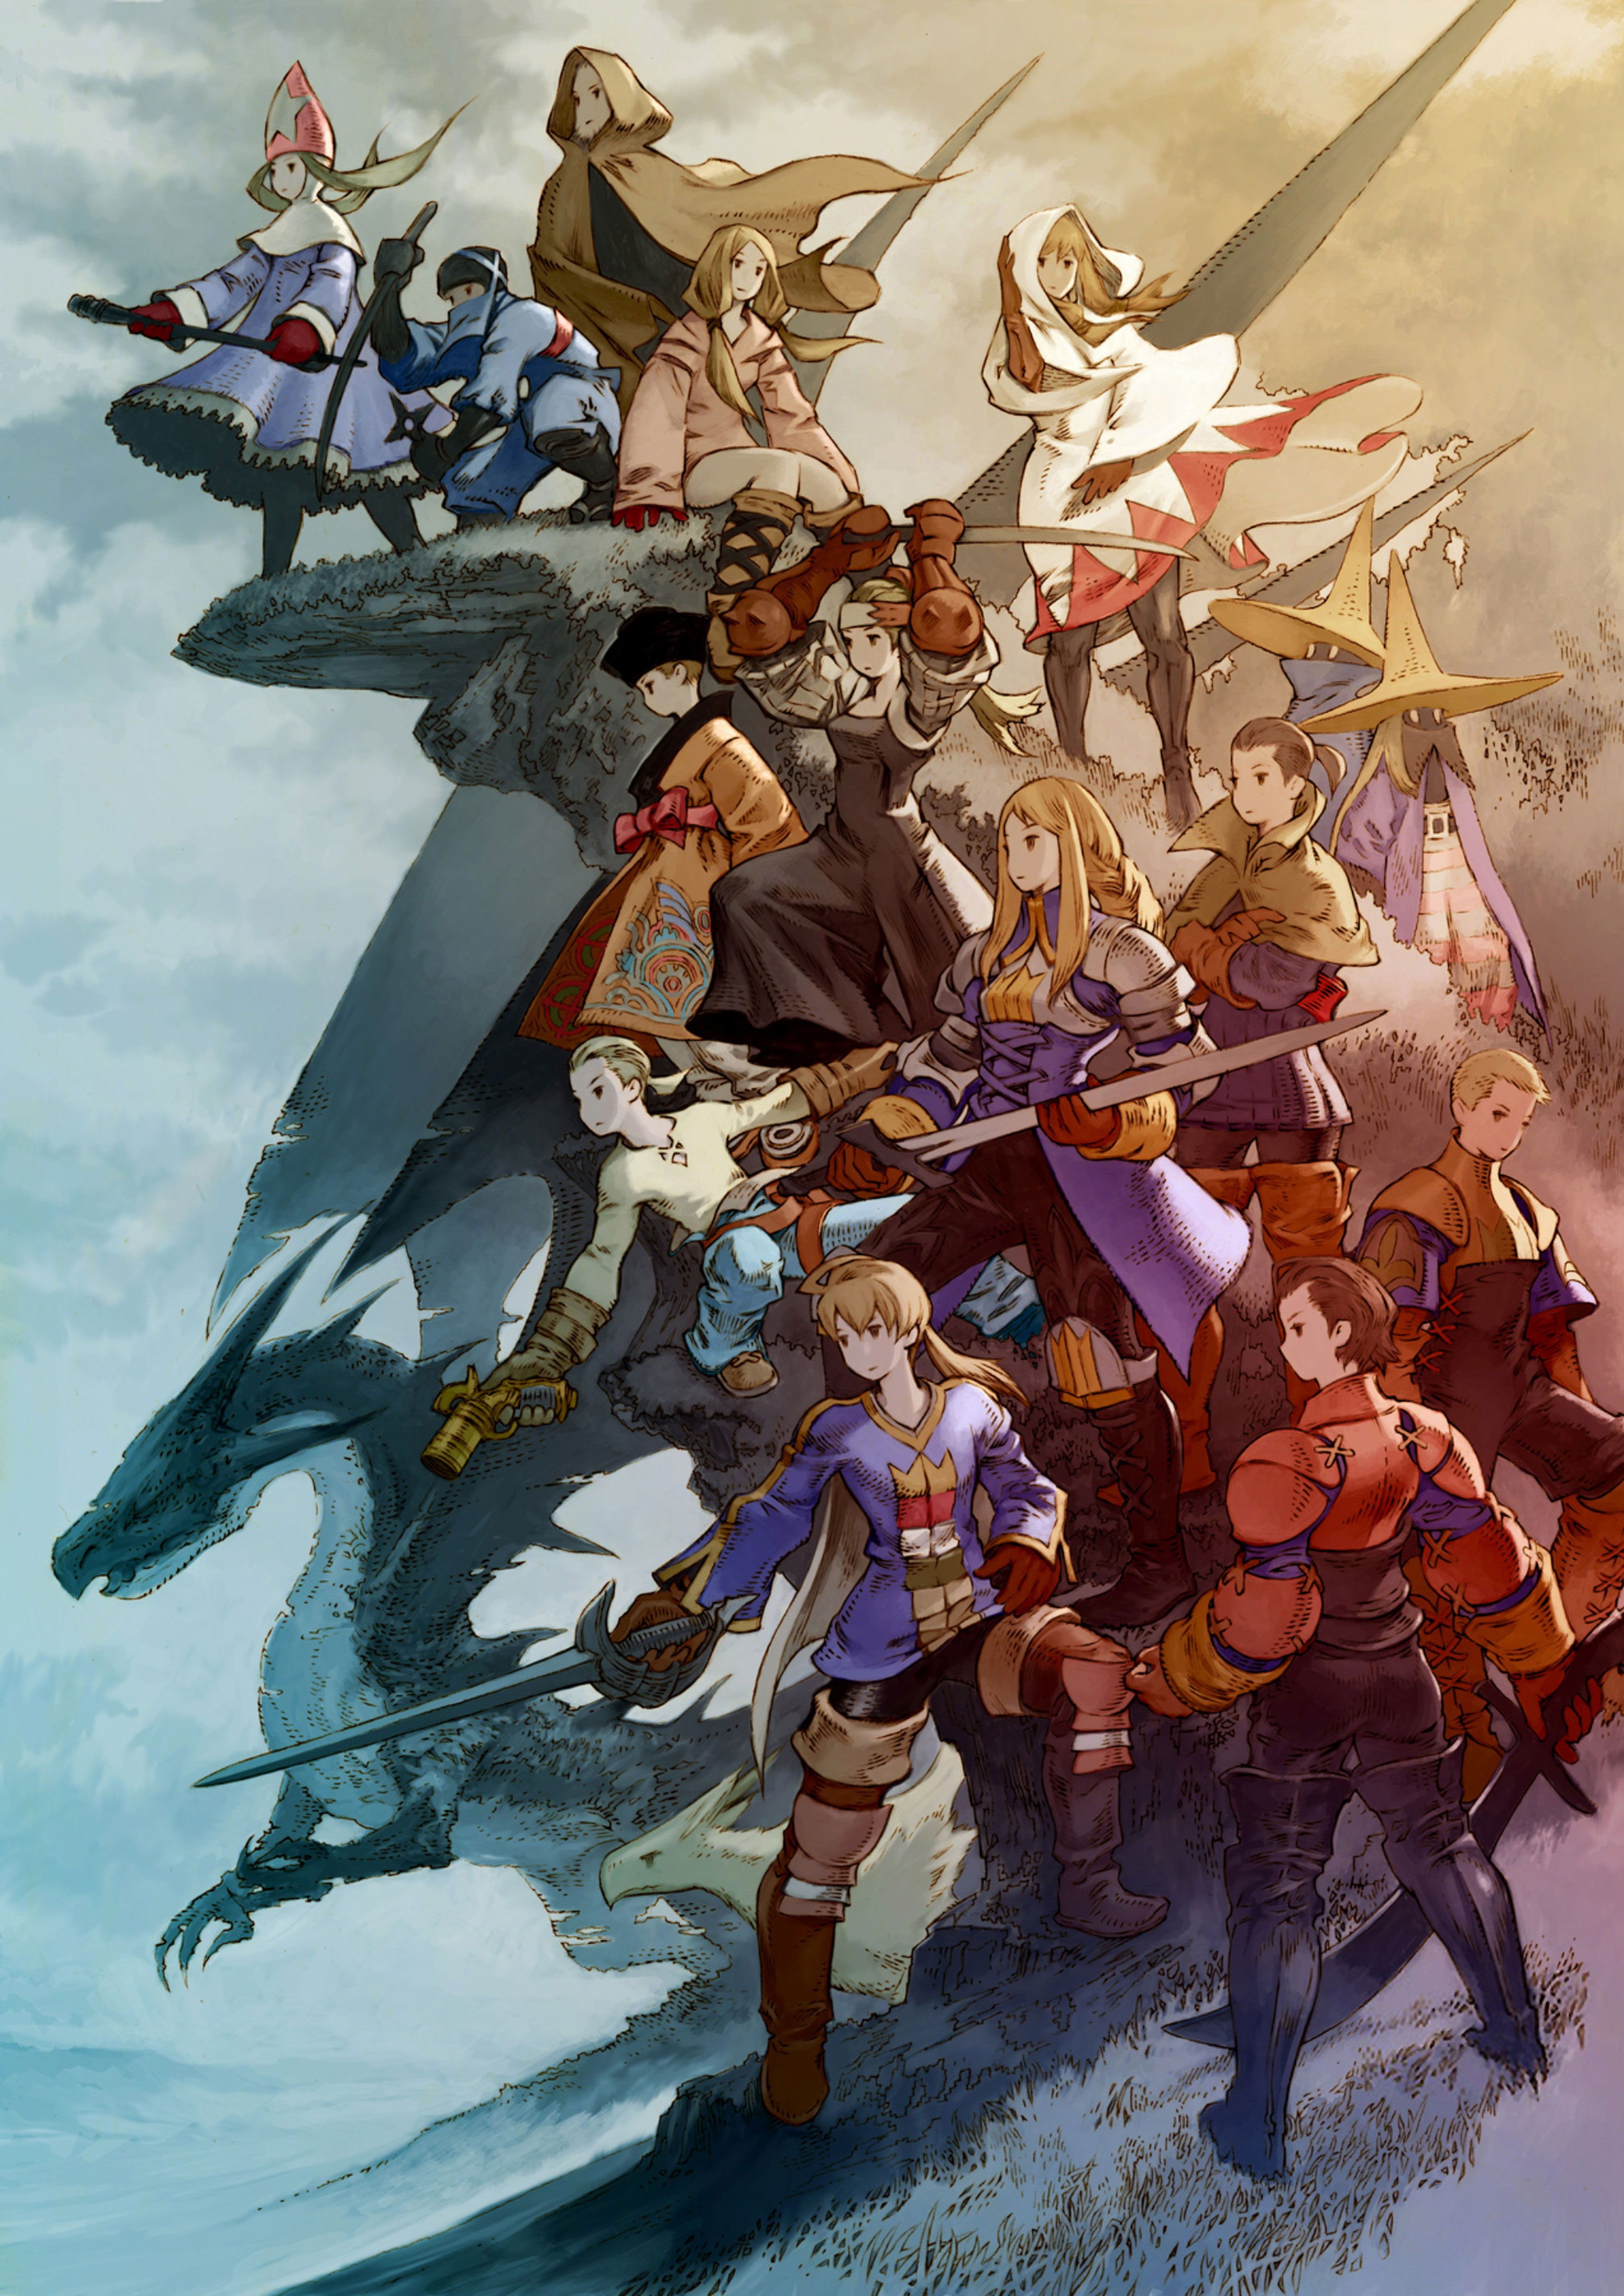 Animal themes of Final Fantasy Characters